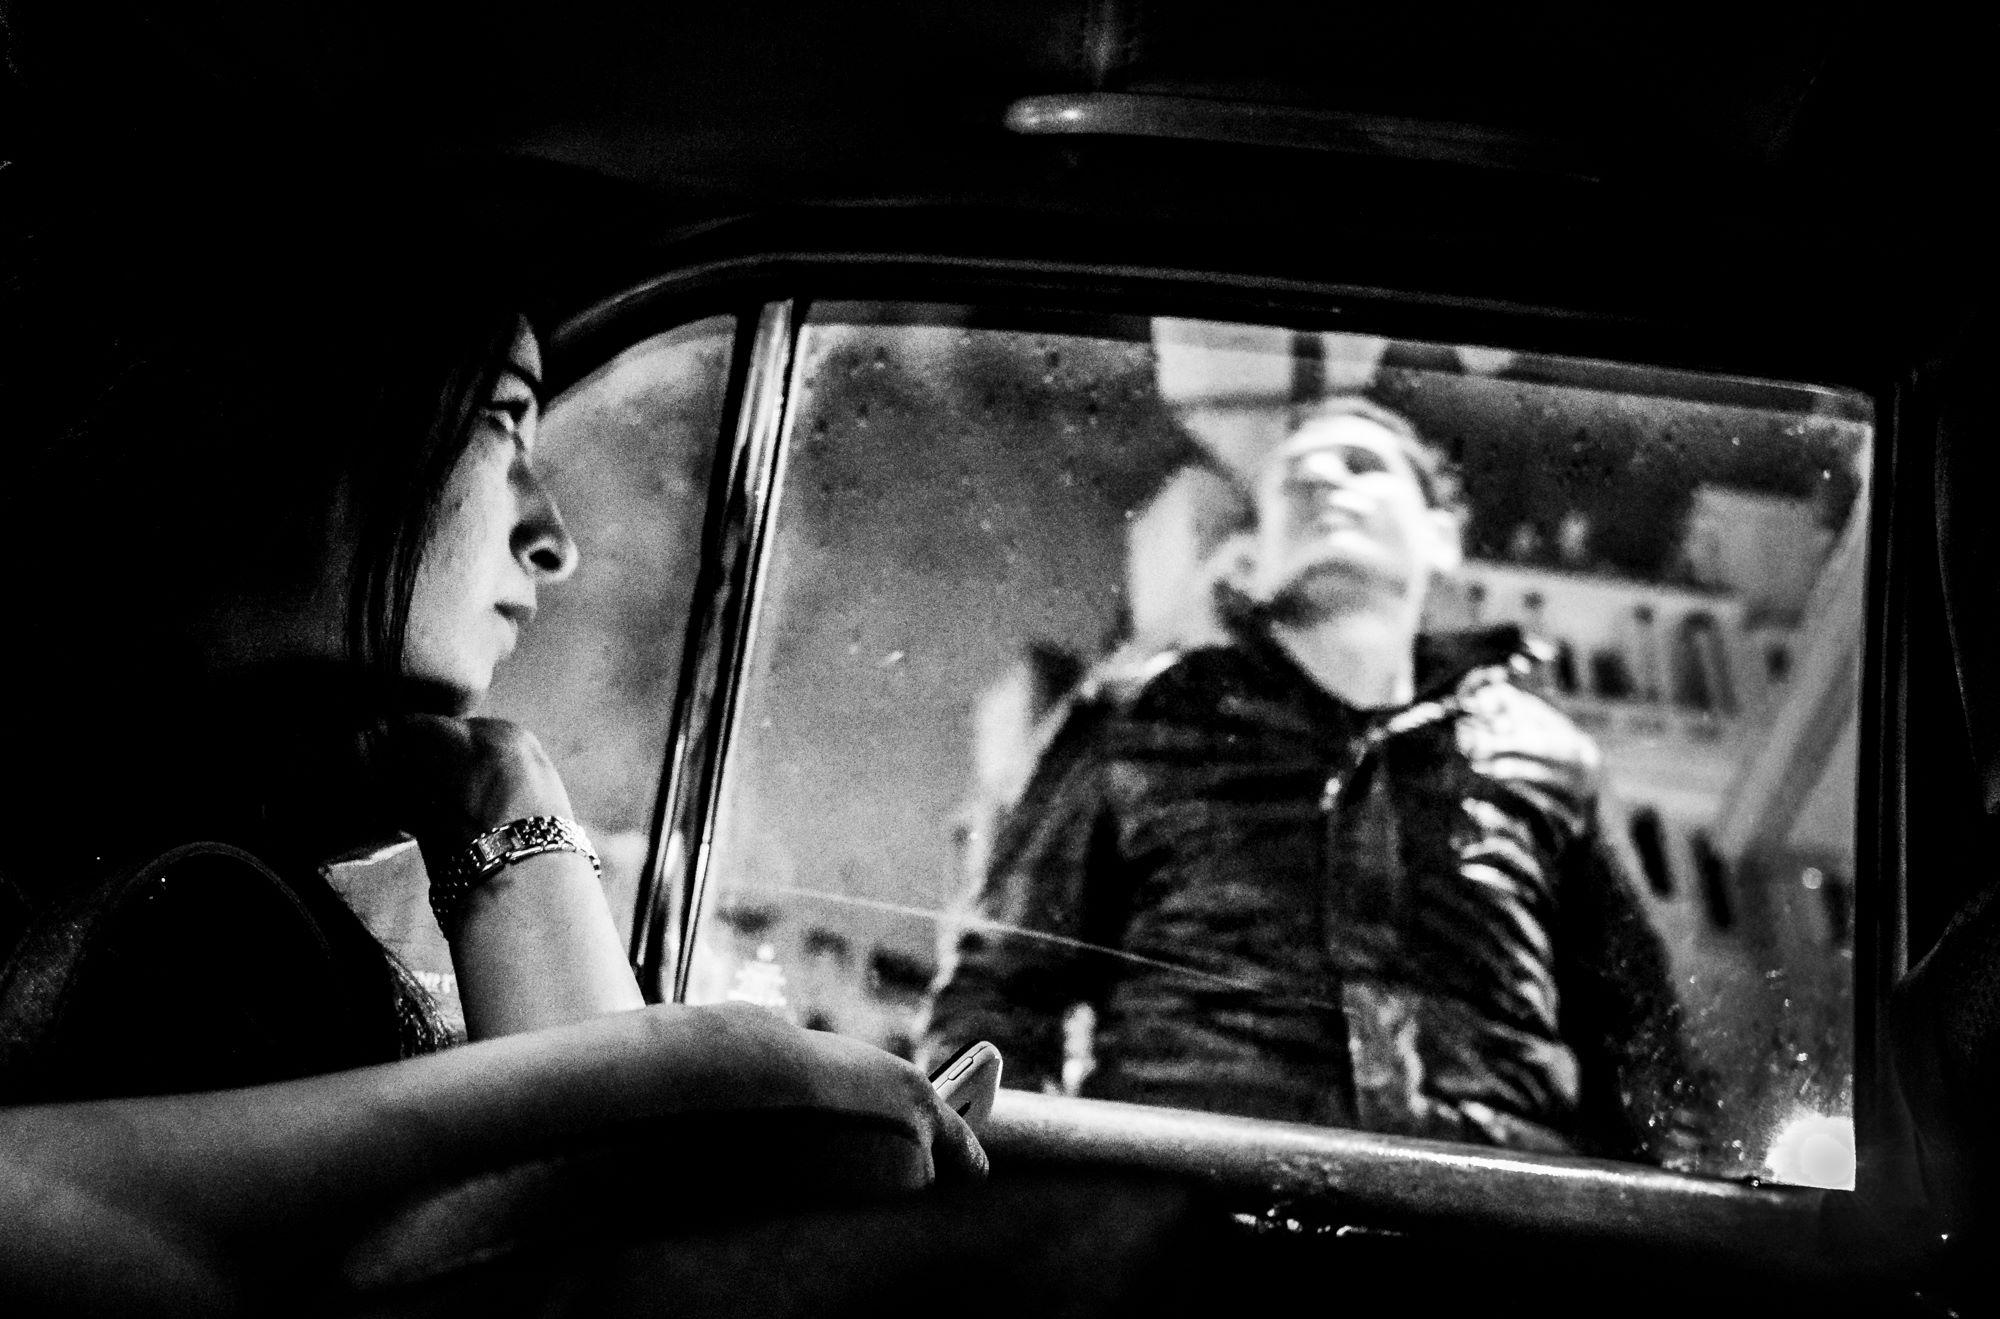 © Yoriyas Yassine Alaoui Ismaili